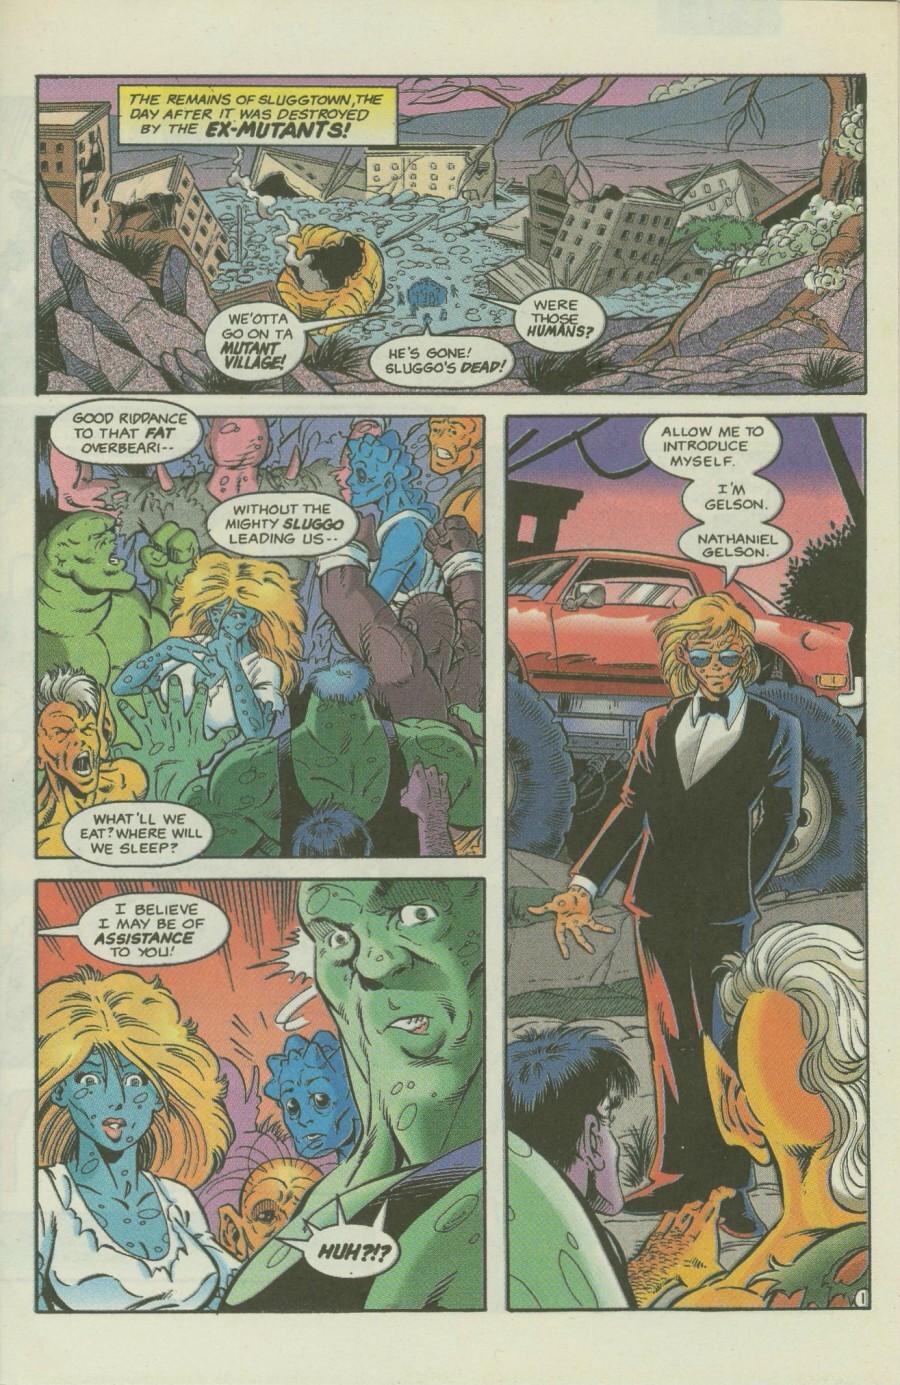 Read online Ex-Mutants comic -  Issue #4 - 3